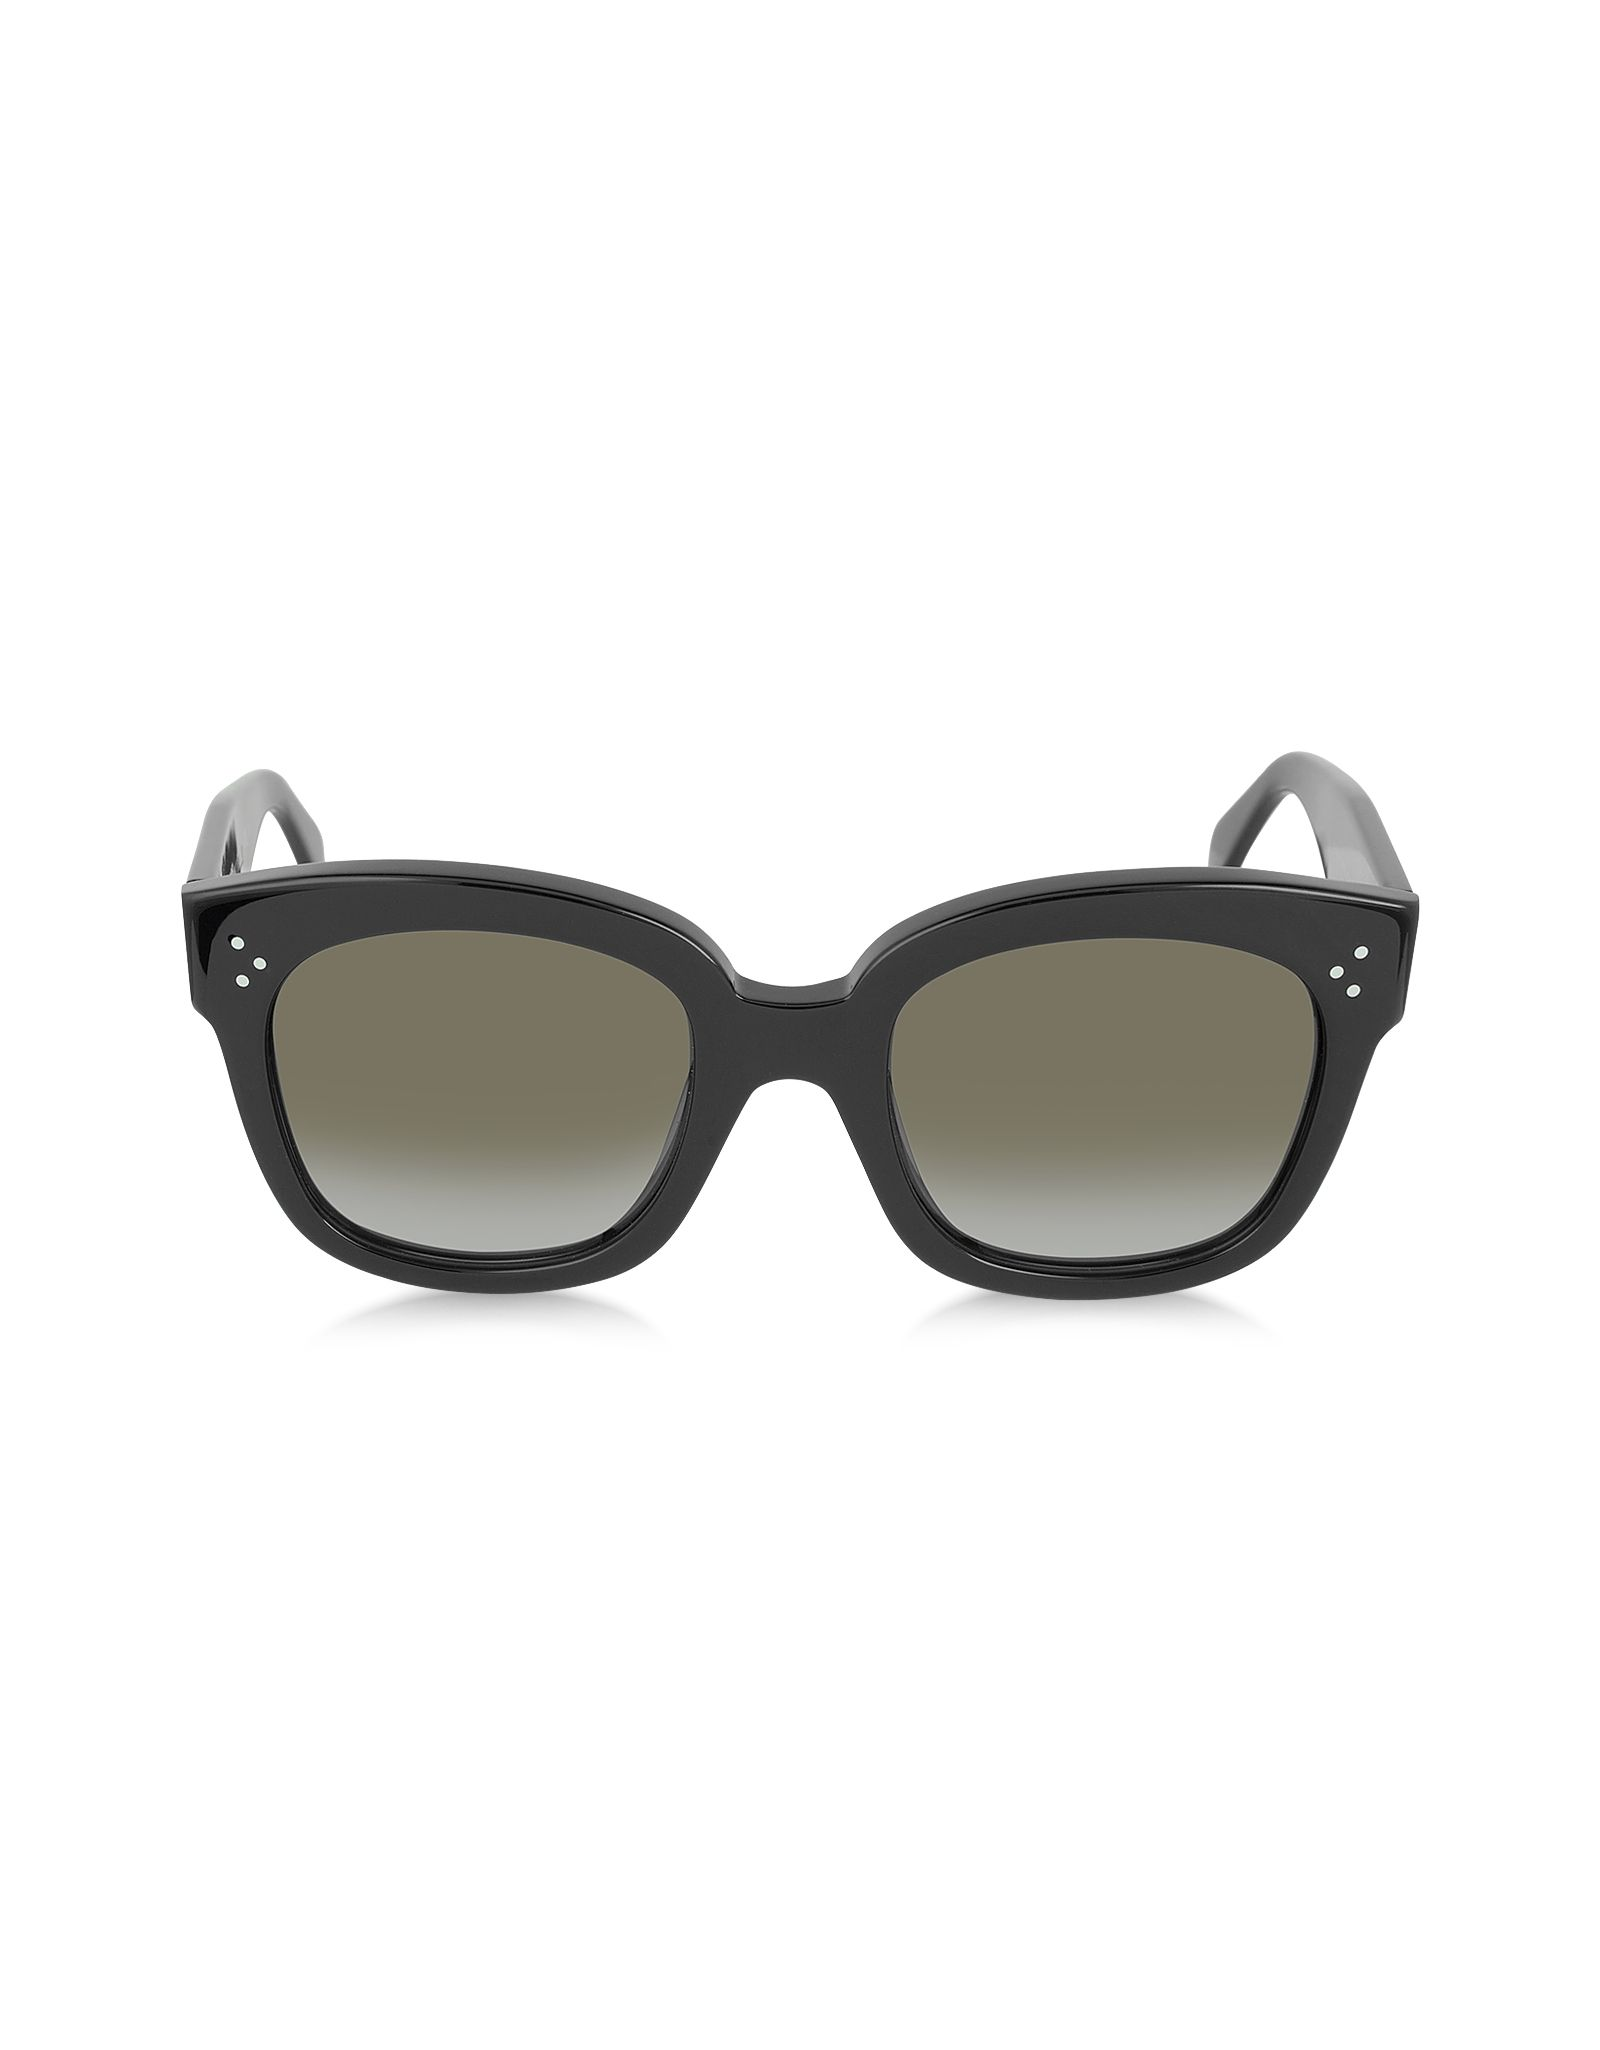 4102adf486b Céline Black Gradient Brown CL41805 S New Audrey Black Acetate Sunglasses  at FORZIERI